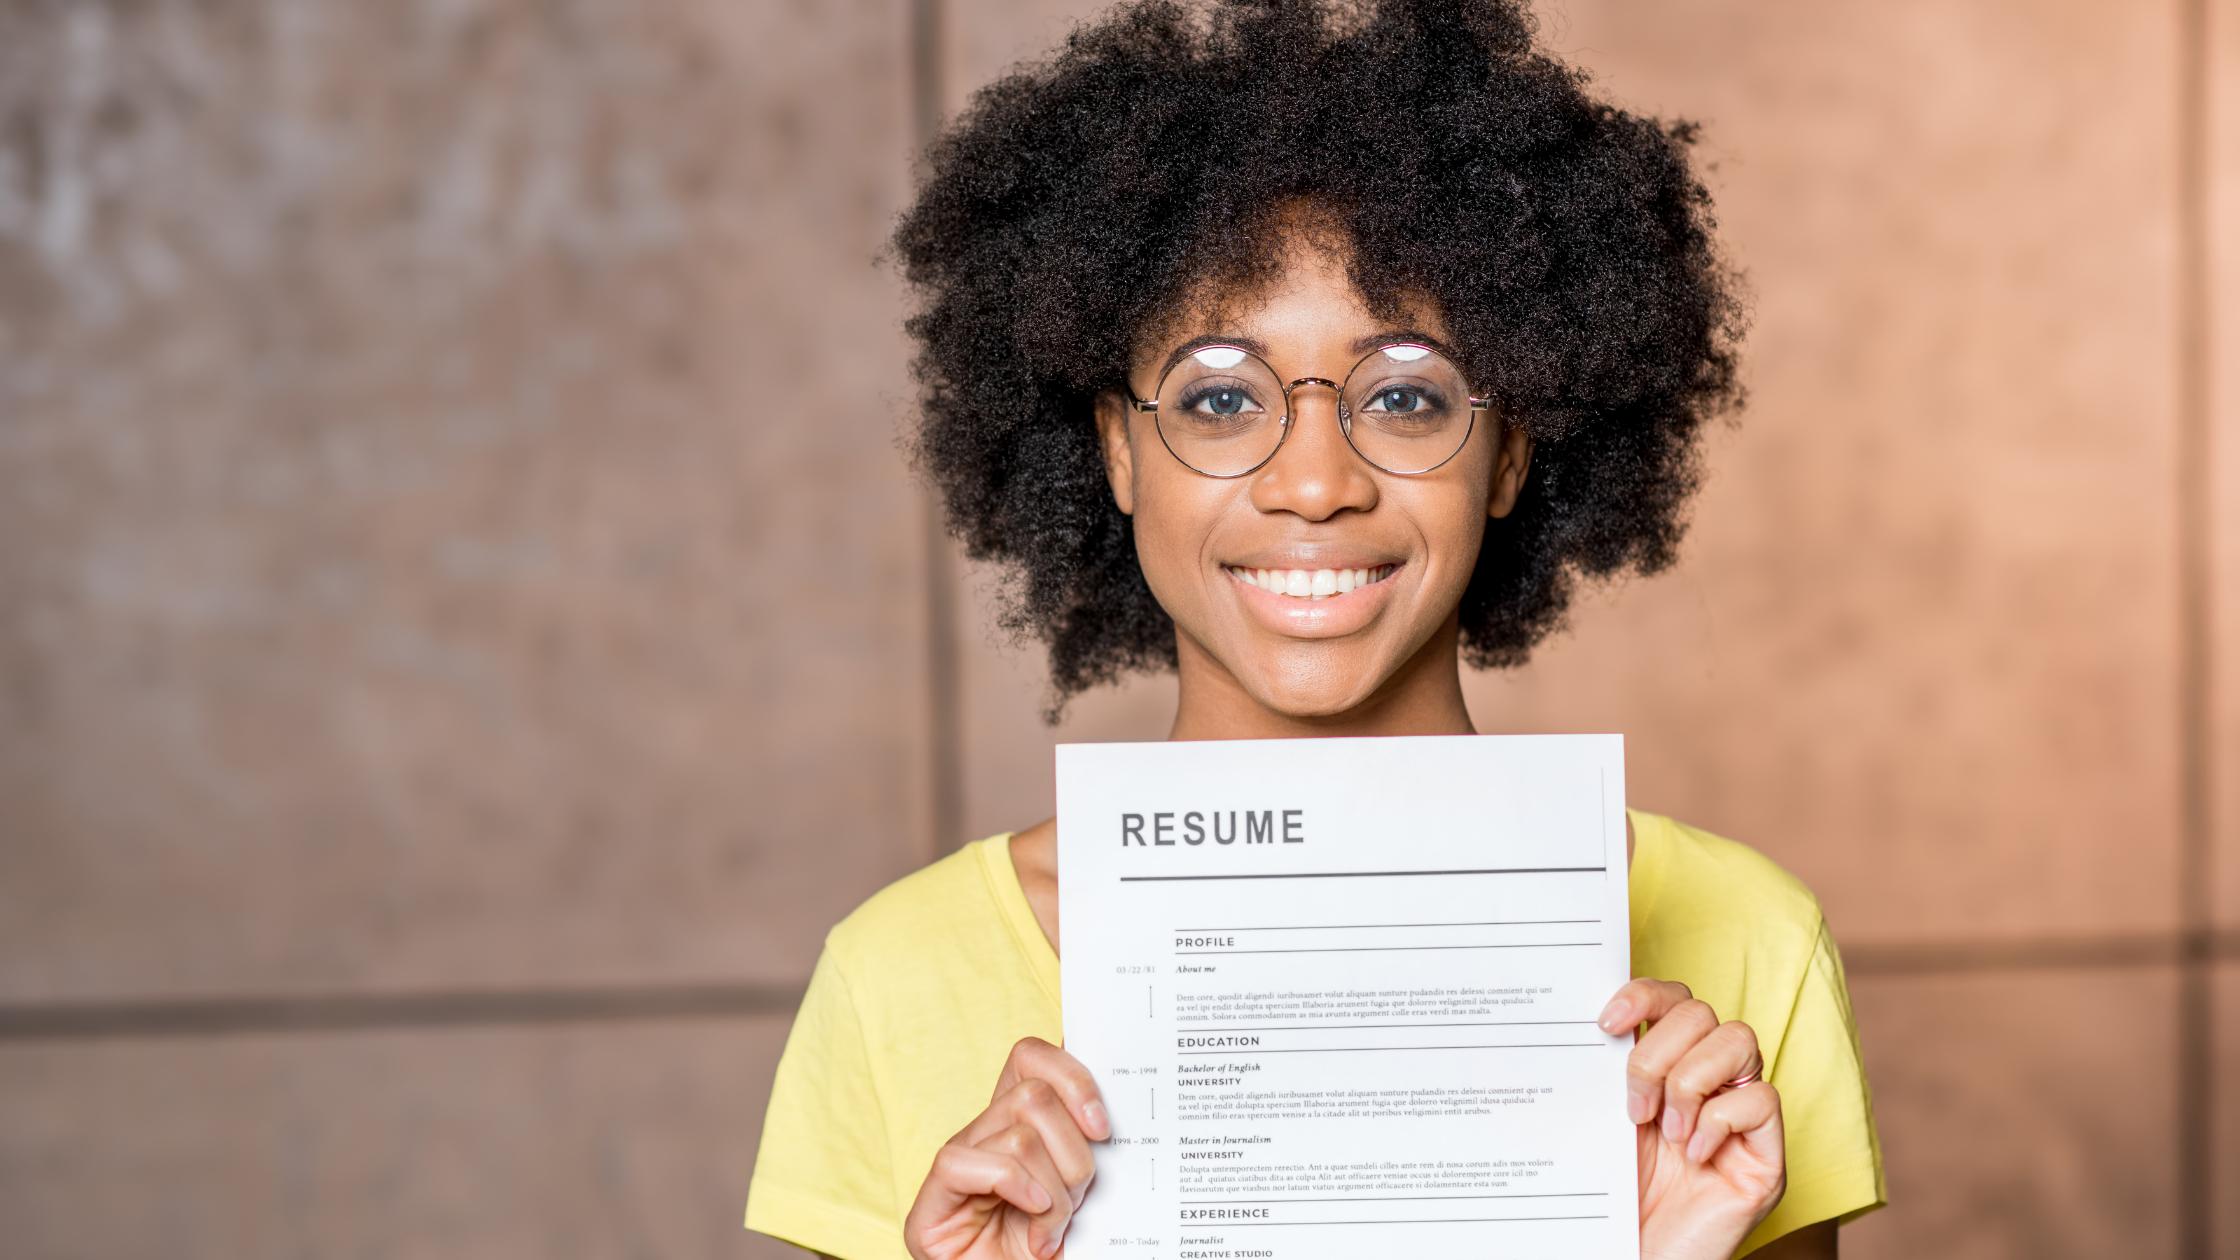 Job candidate holding standard resume